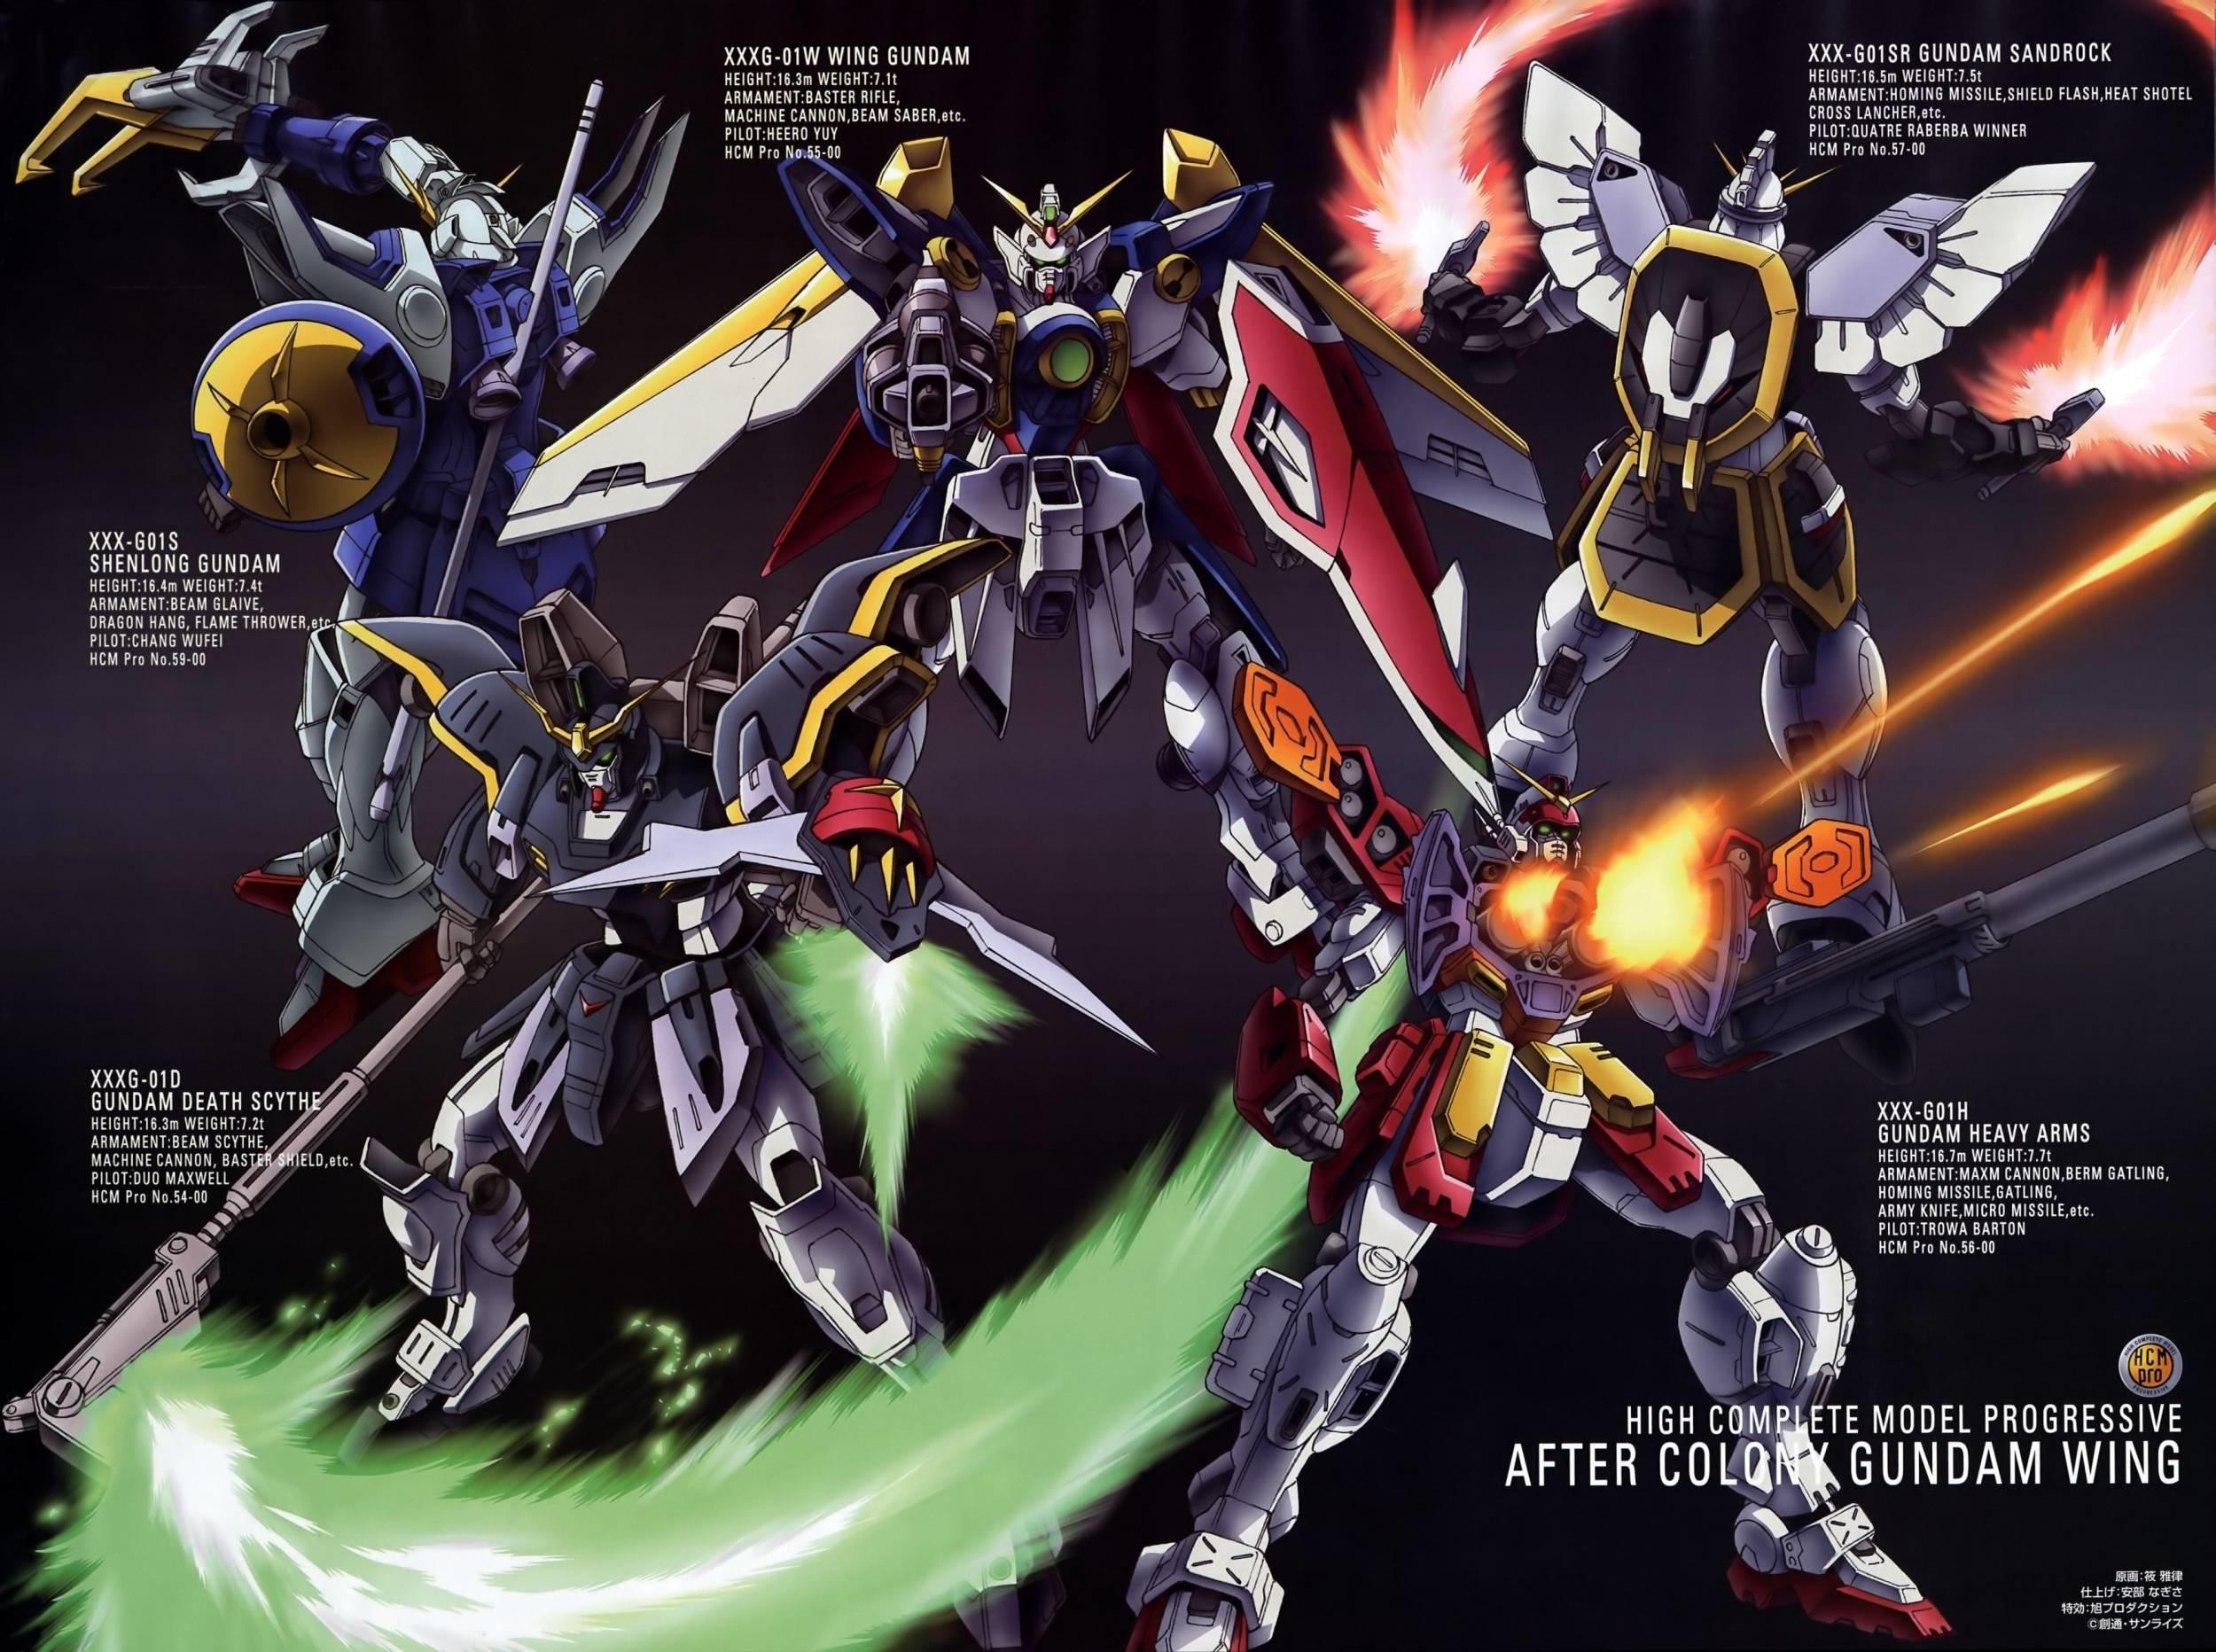 Robotech Free Gundam Wing Wallpapers